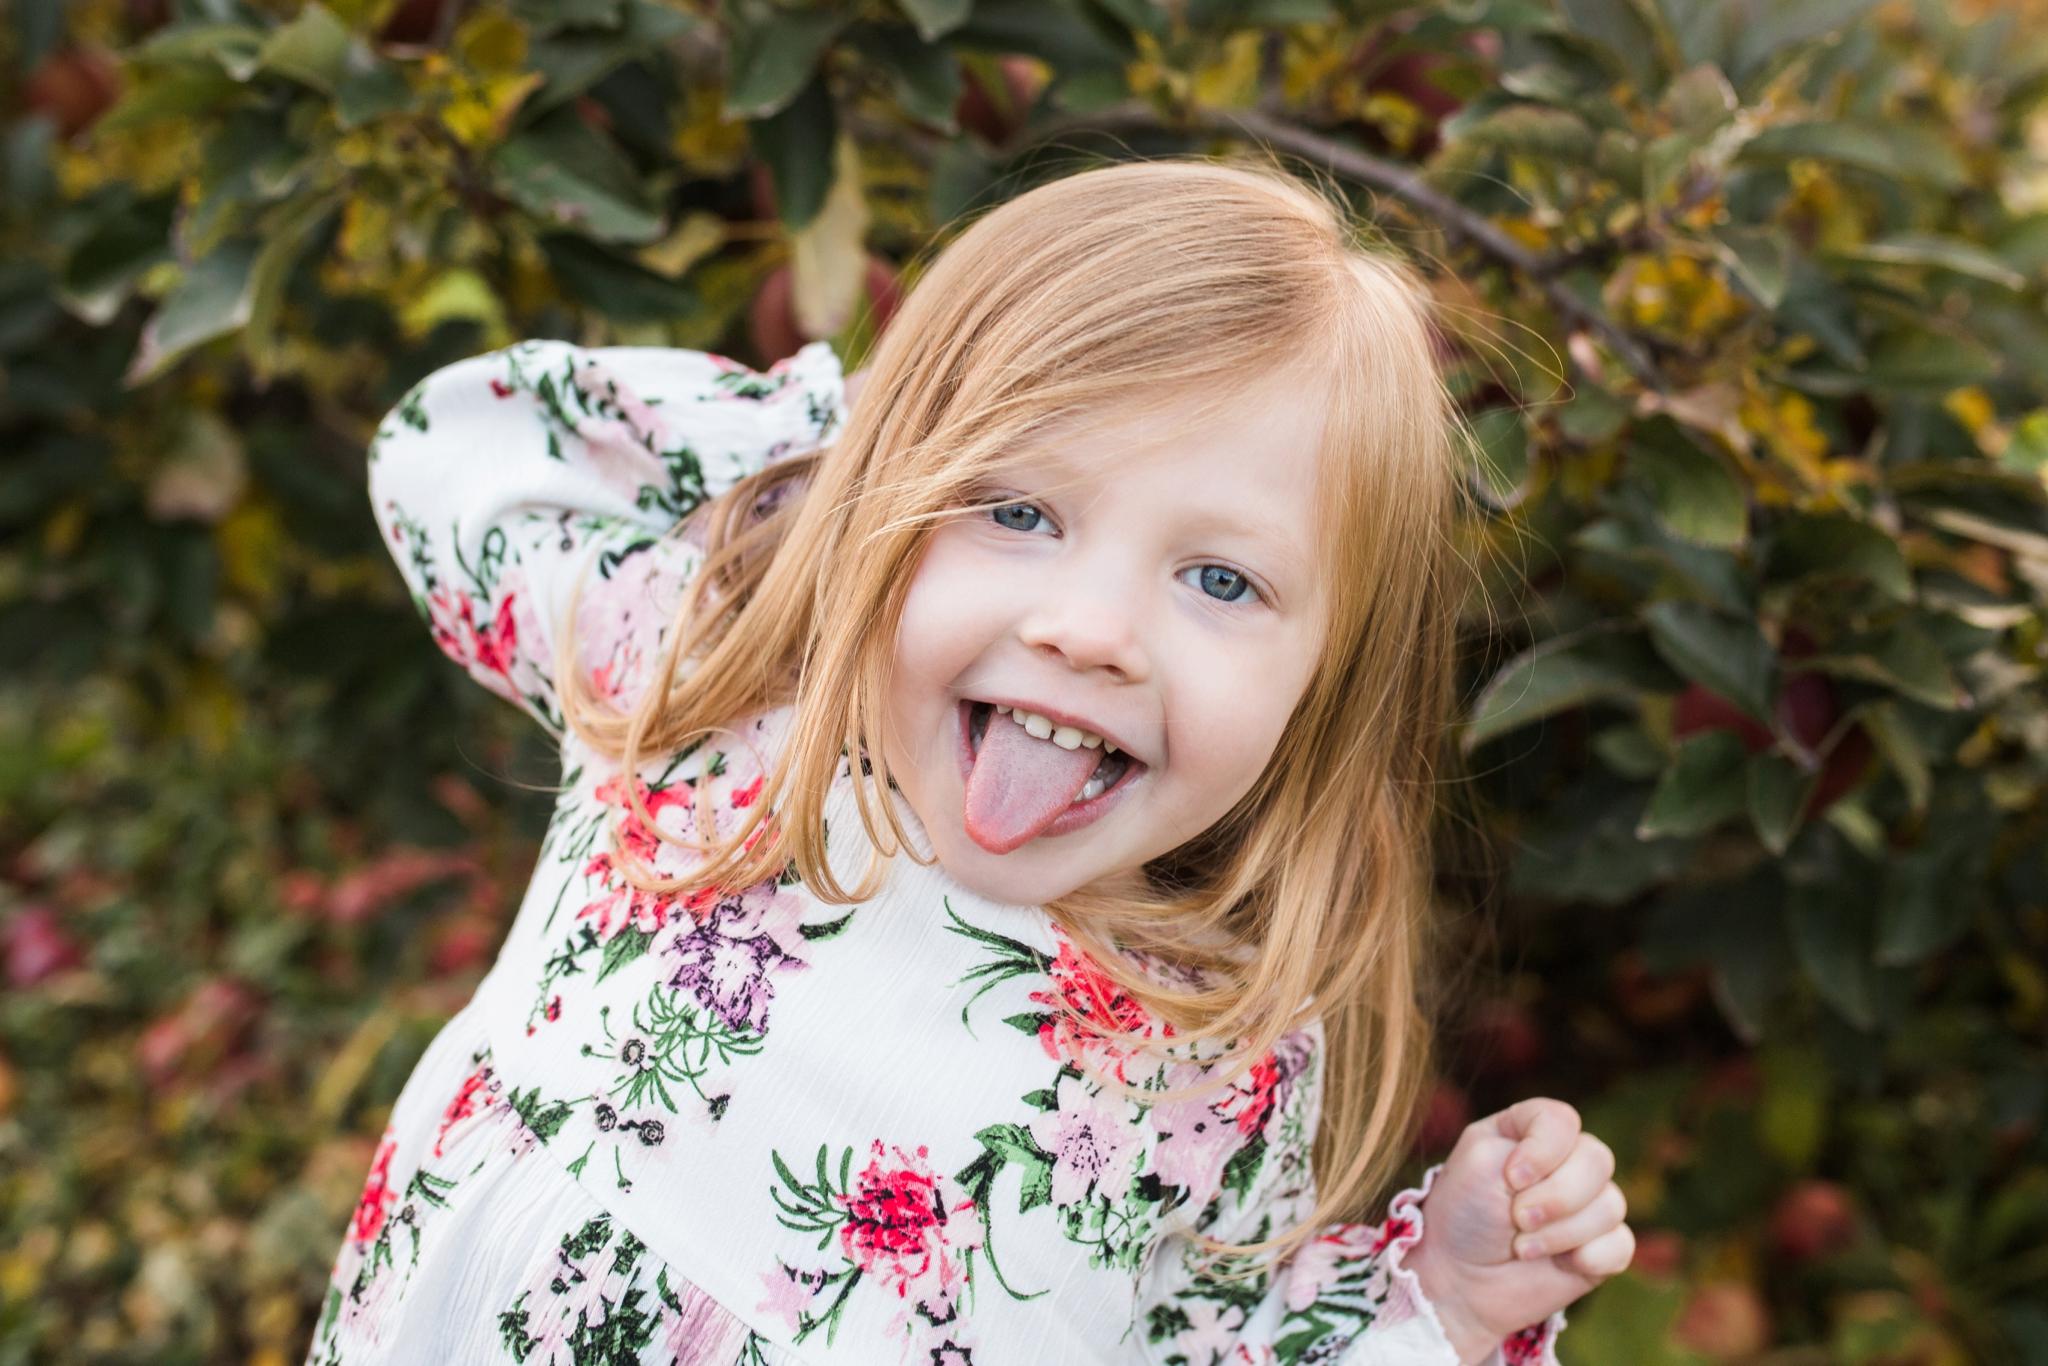 Emily Grace Photography, Elizabethtown PA Family Portrait Photographer, Apple Orchard Fall Photos, Masonic Village Farmers Market